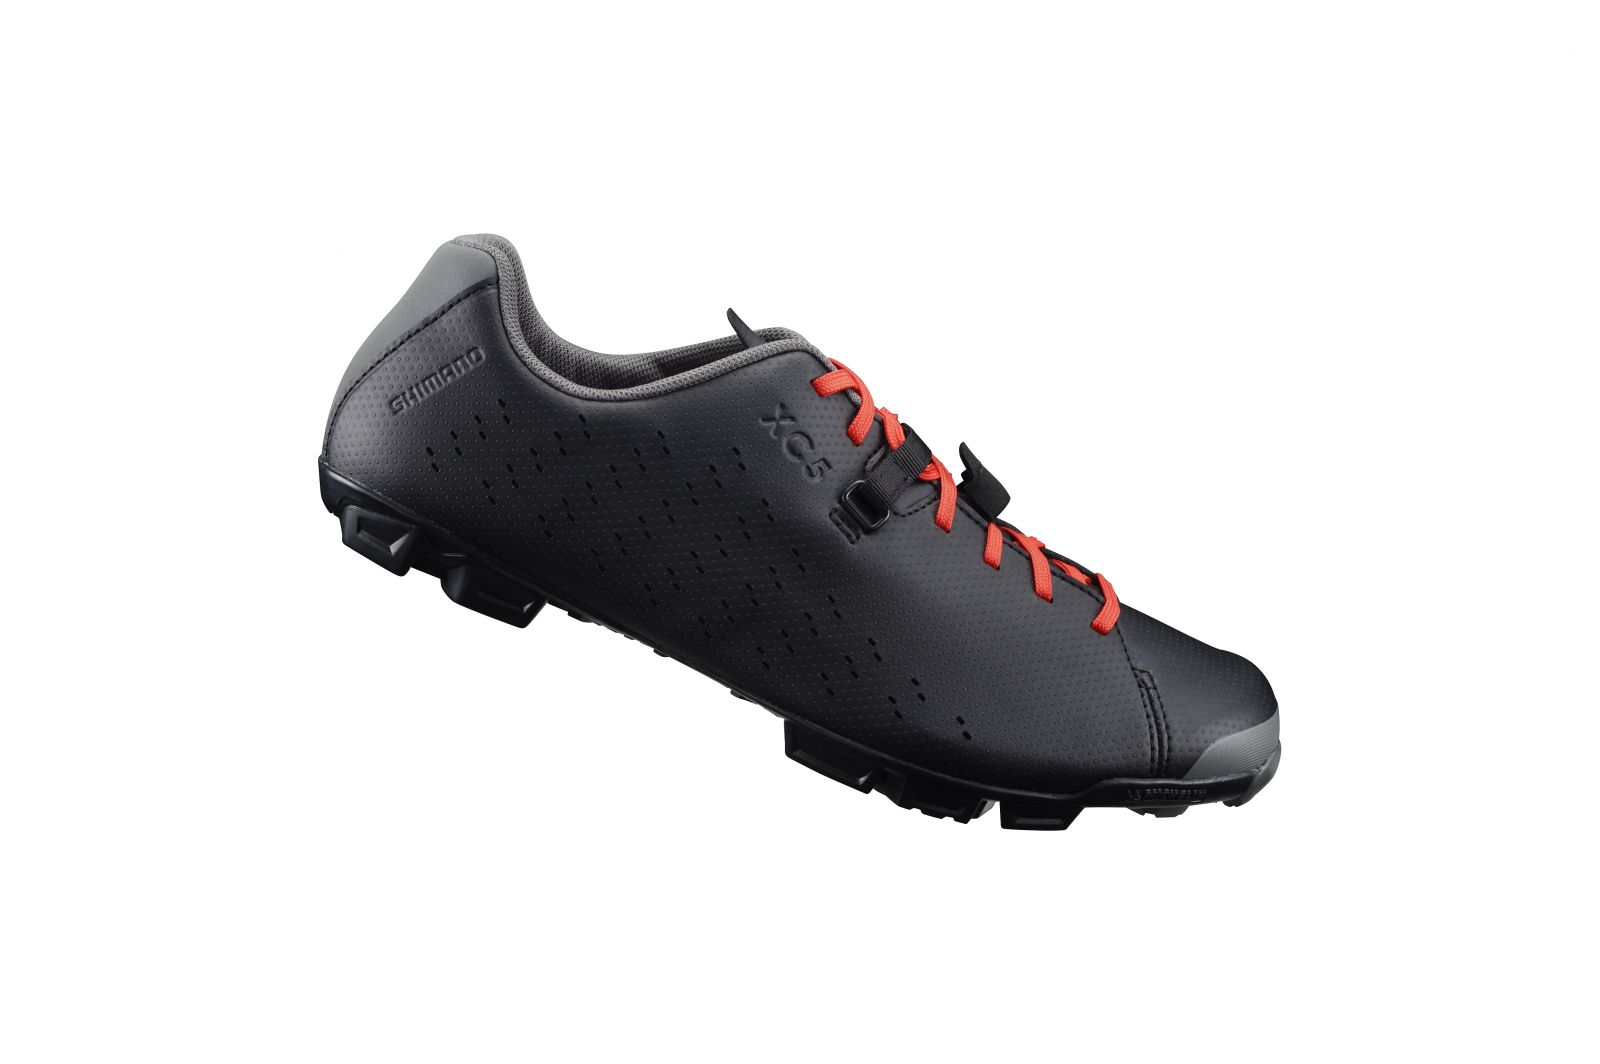 SHIMANO MTB obuv SH-XC500ML, černá, 41